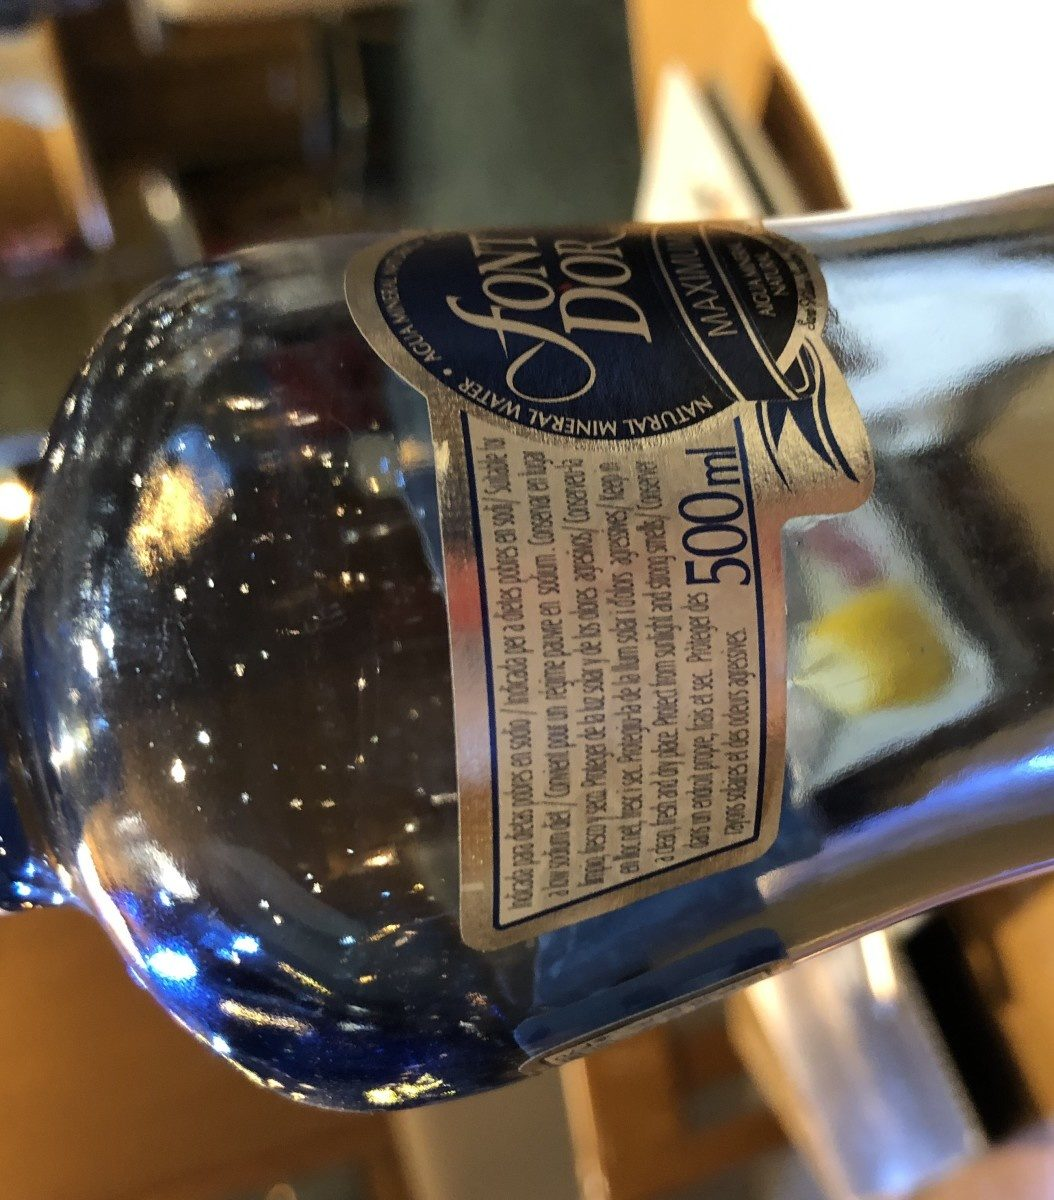 Maximum botella 50 cl - Ingredients